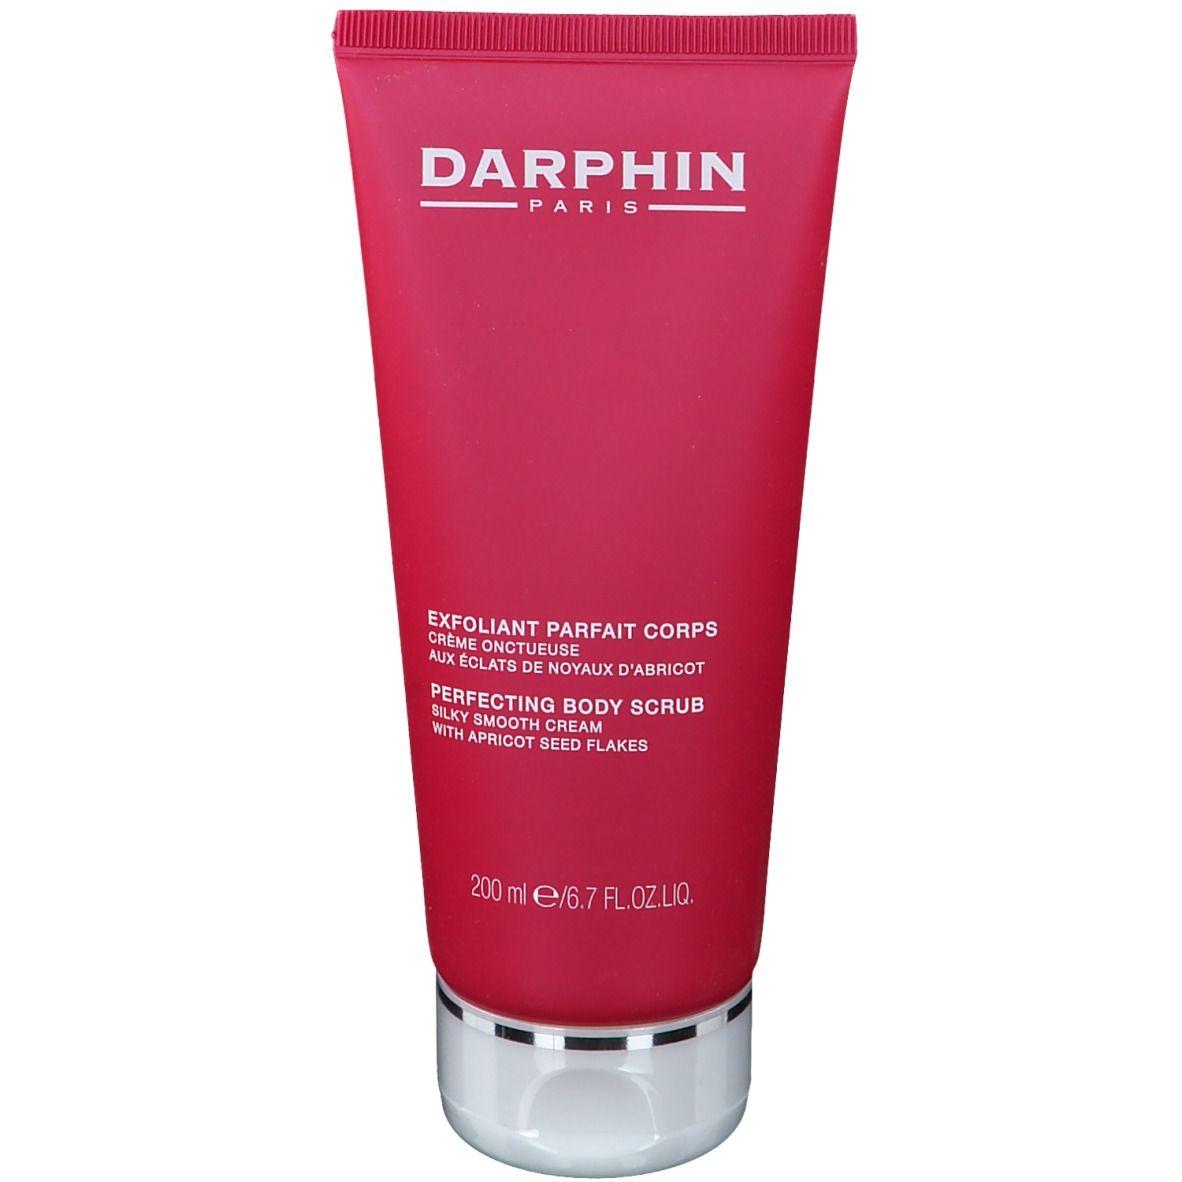 DARPHIN Exfoliant parfait corps ml gel(s)